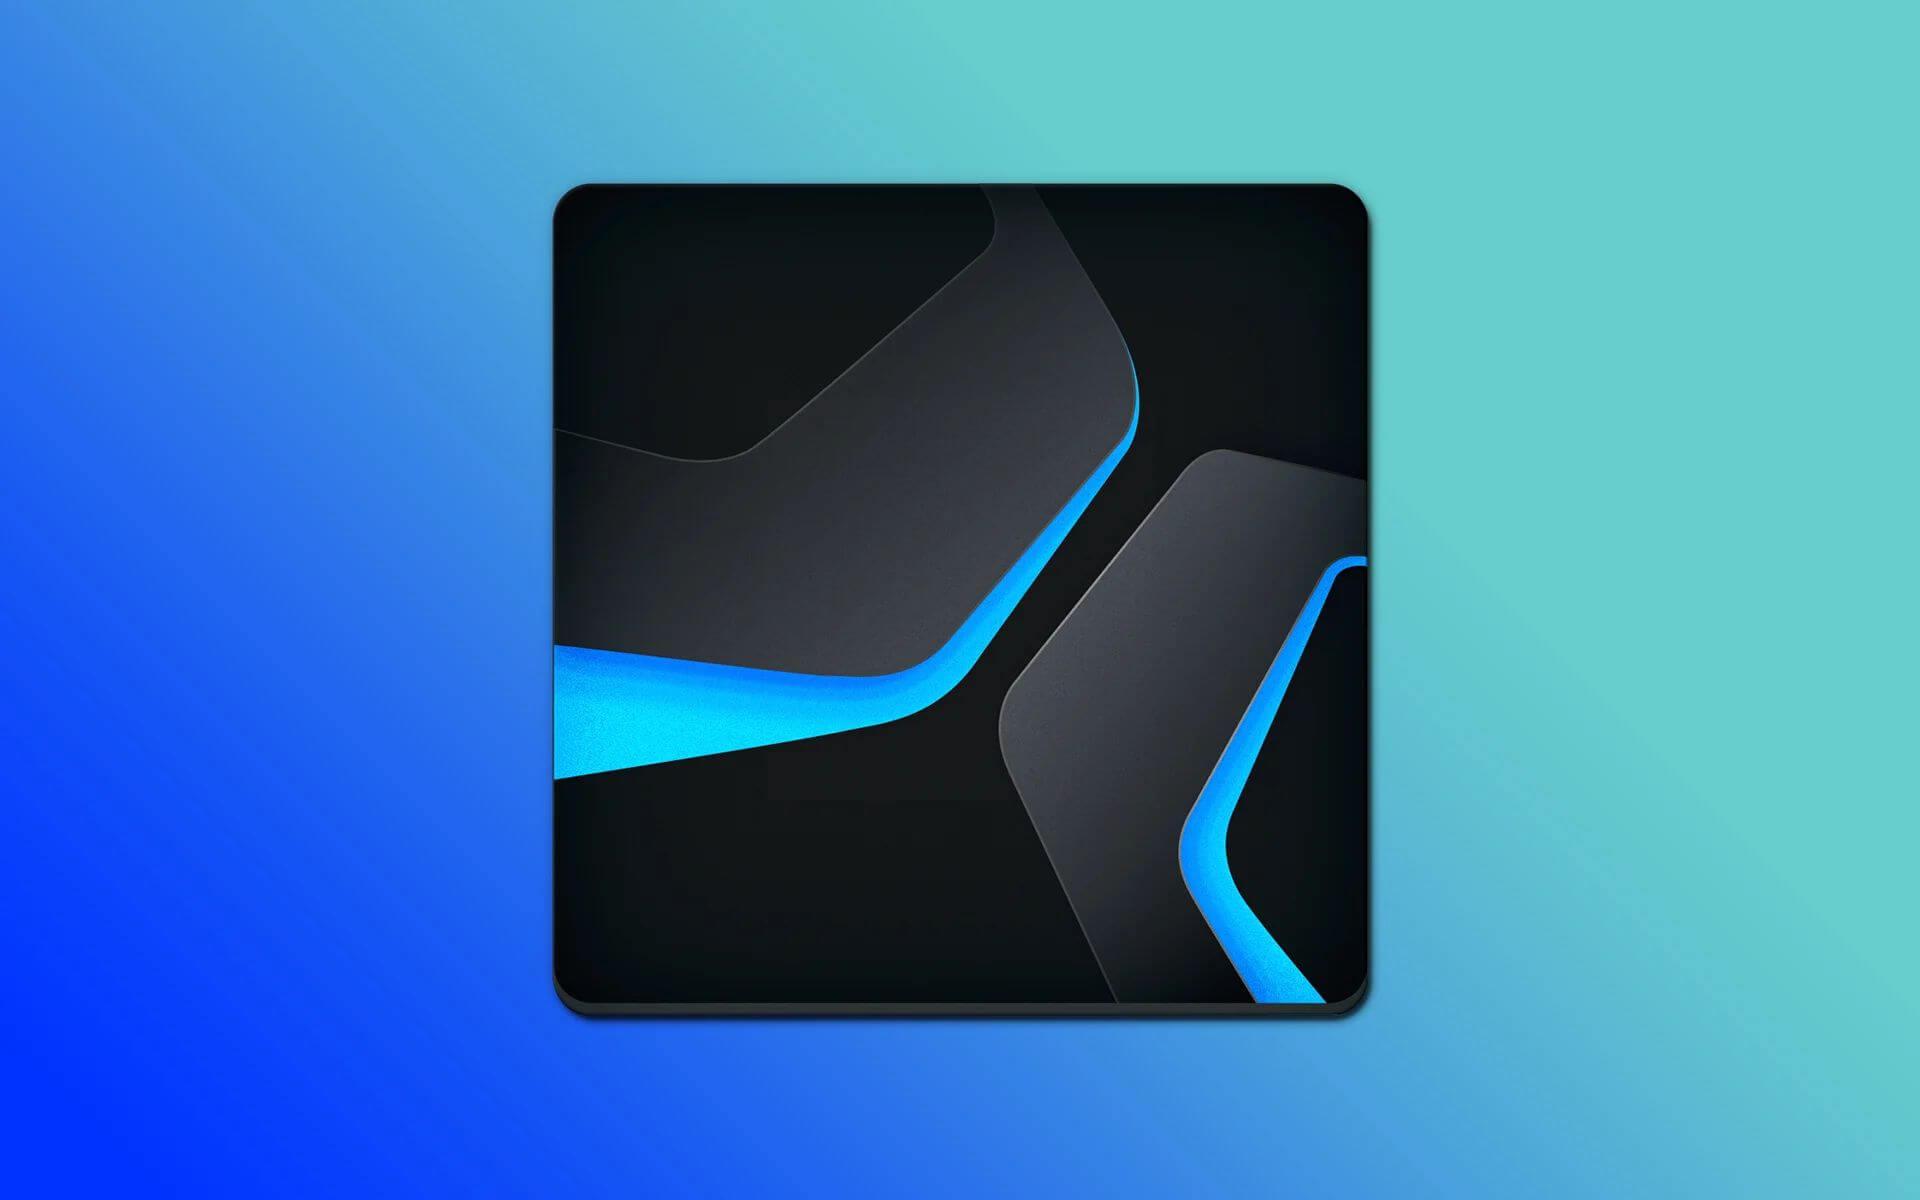 Presonus Studio One Pro 5.2.0 Crack +License Key Full Download 2021